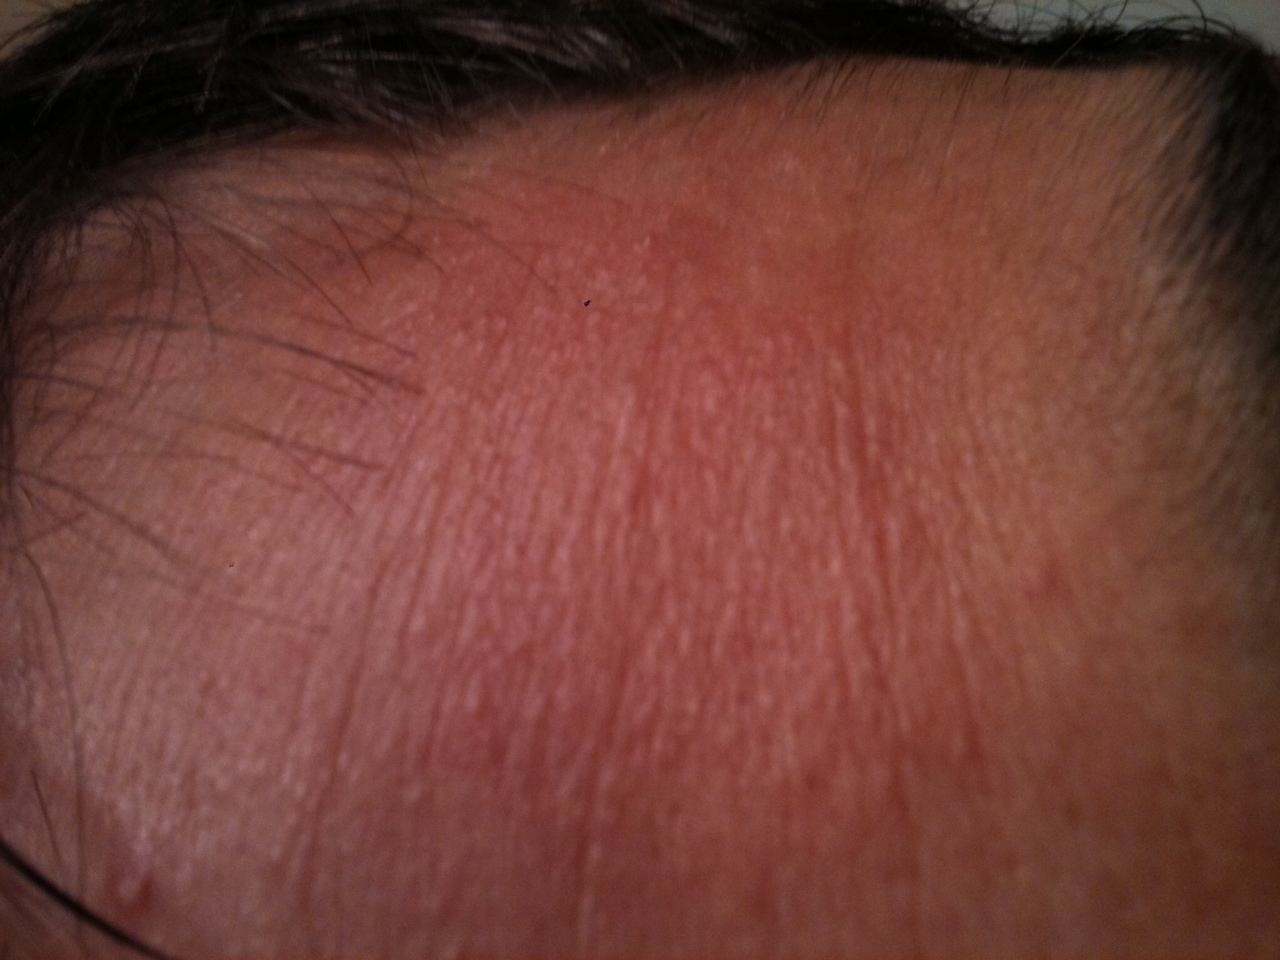 picture of penis rash jpg 1200x900